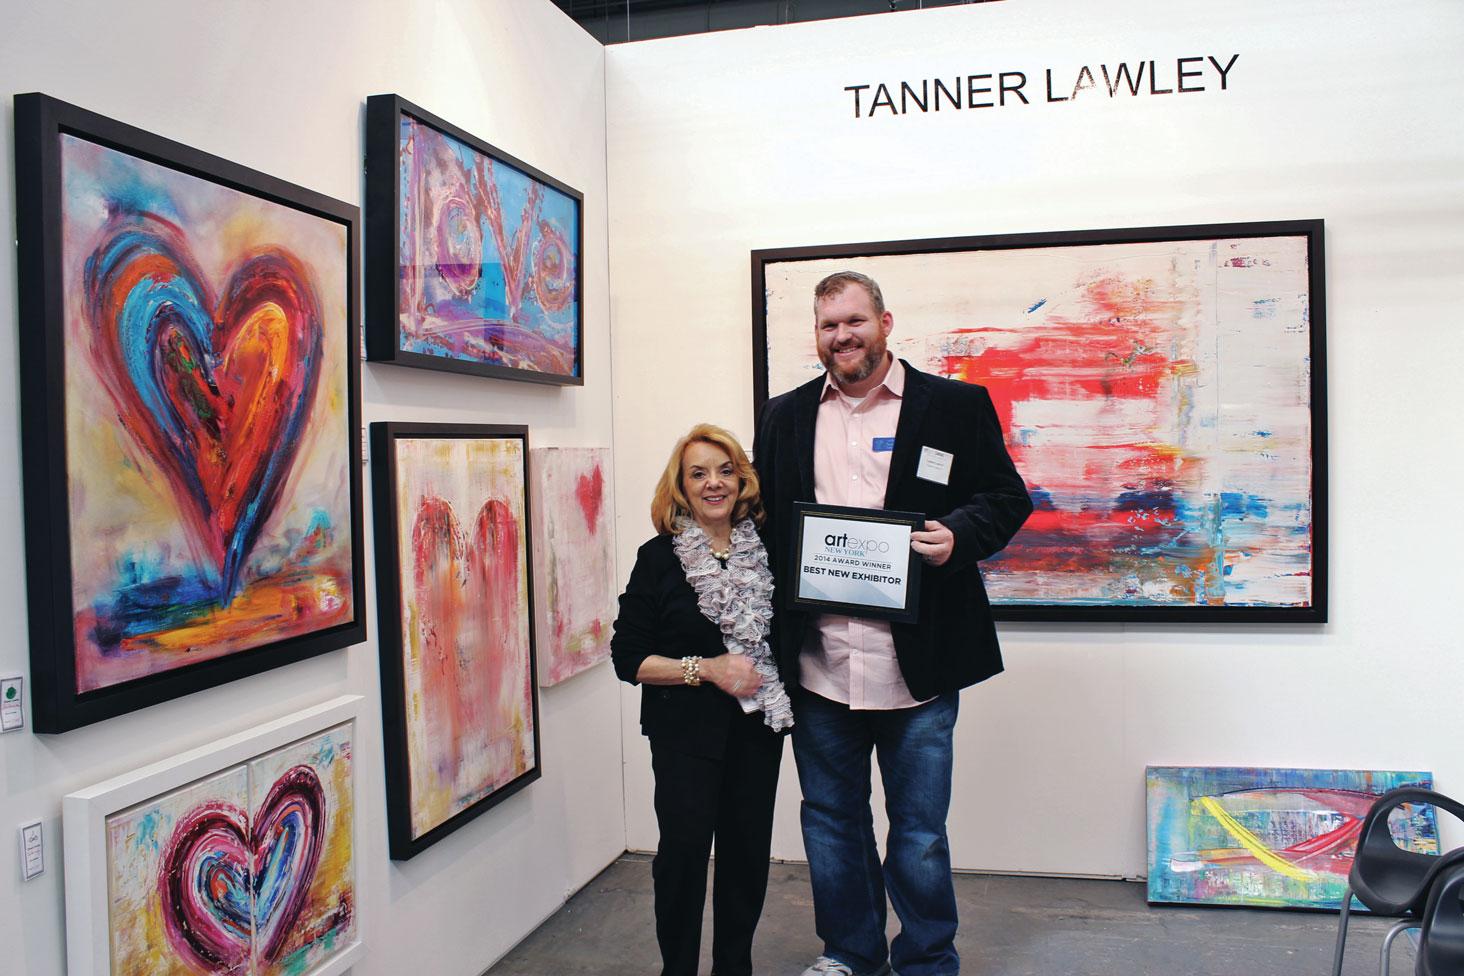 Tanner-Lawley_CMYK_01